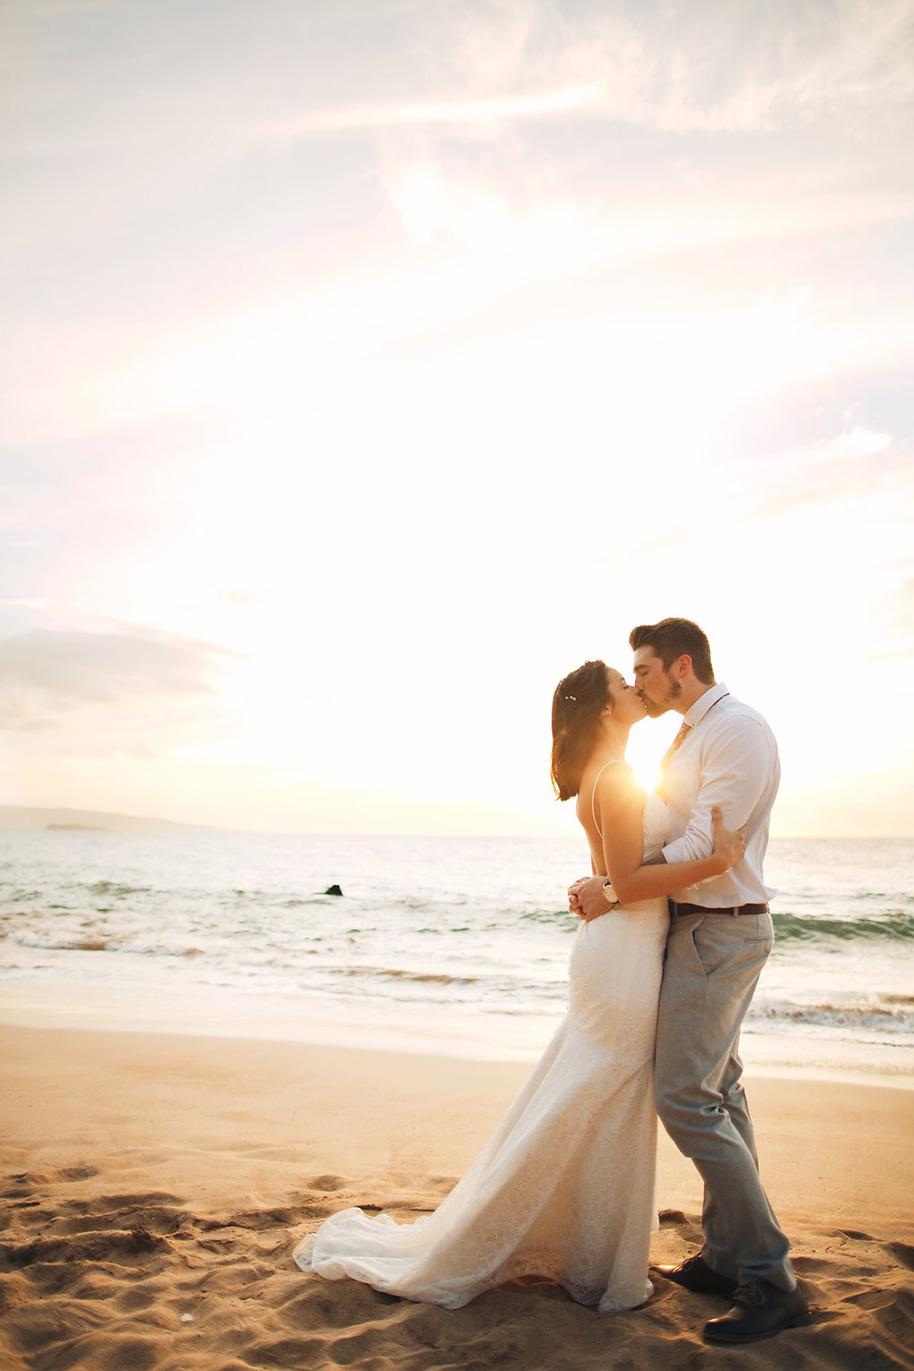 Maui-Beach-Wedding-070616-25